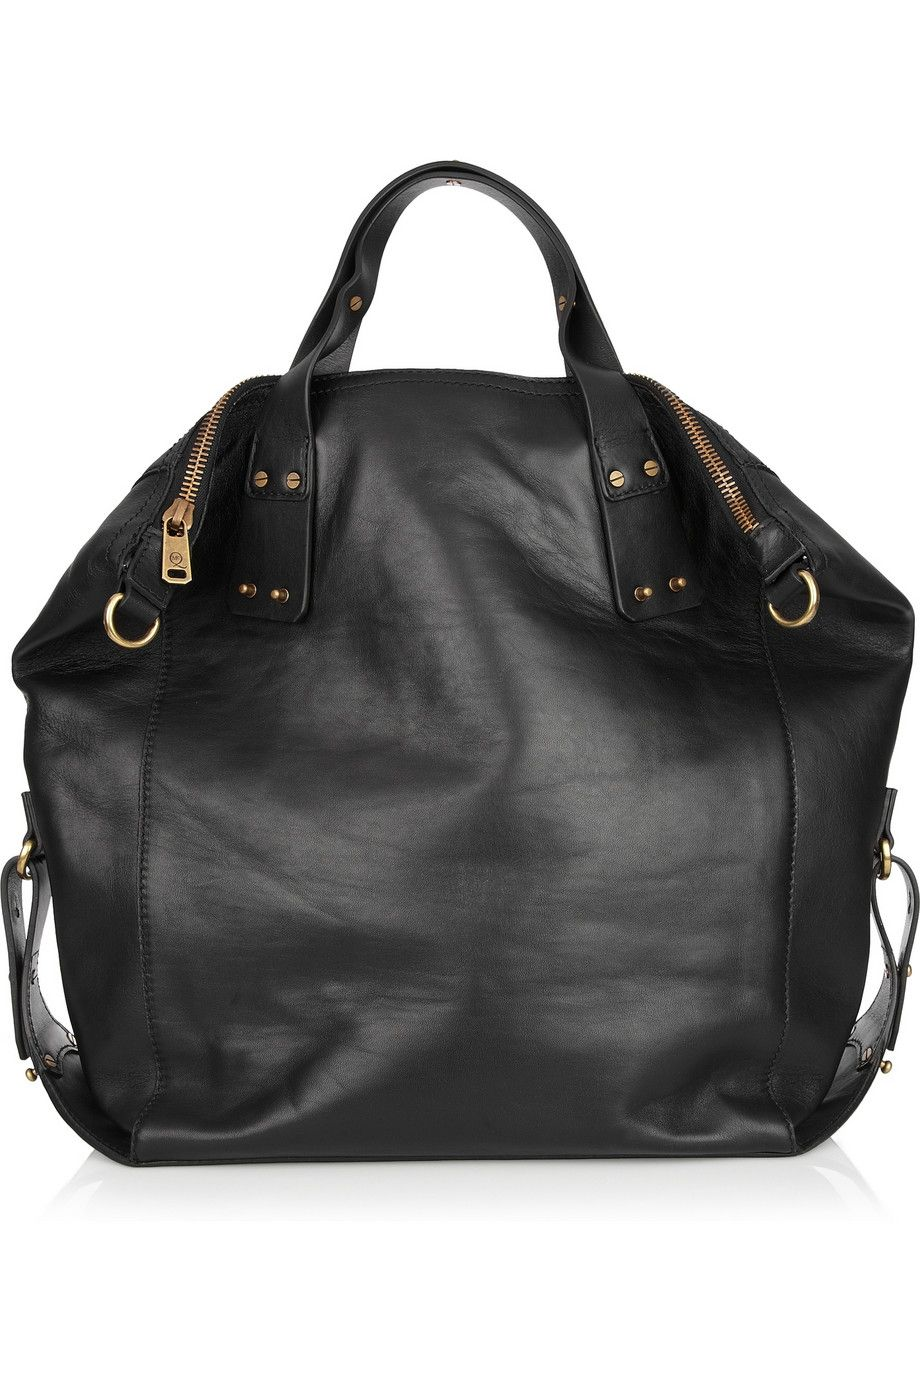 the perfect fall bag...McQ Alexander McQueen Stepney leather tote  NET-A-PORTER.COM